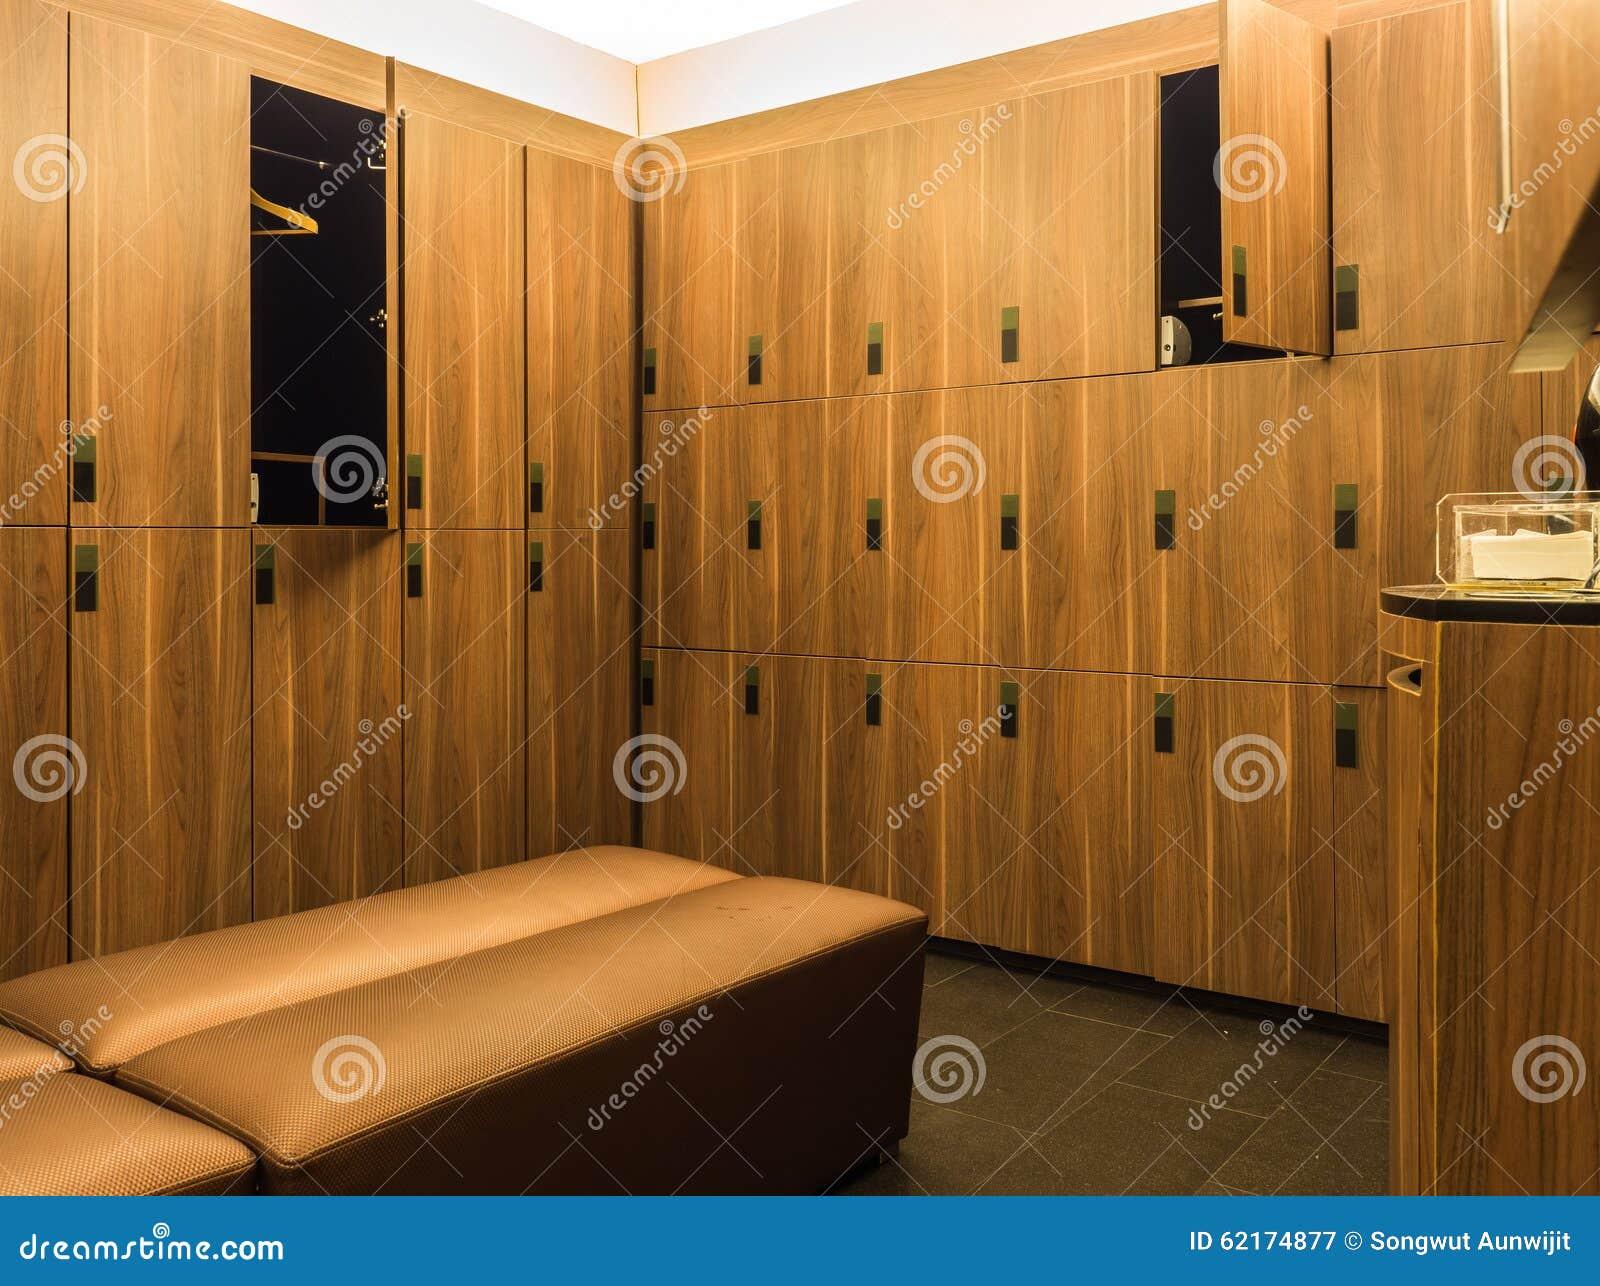 Design of modern wooden lockers stock photo image 62174877 for Designer lockers